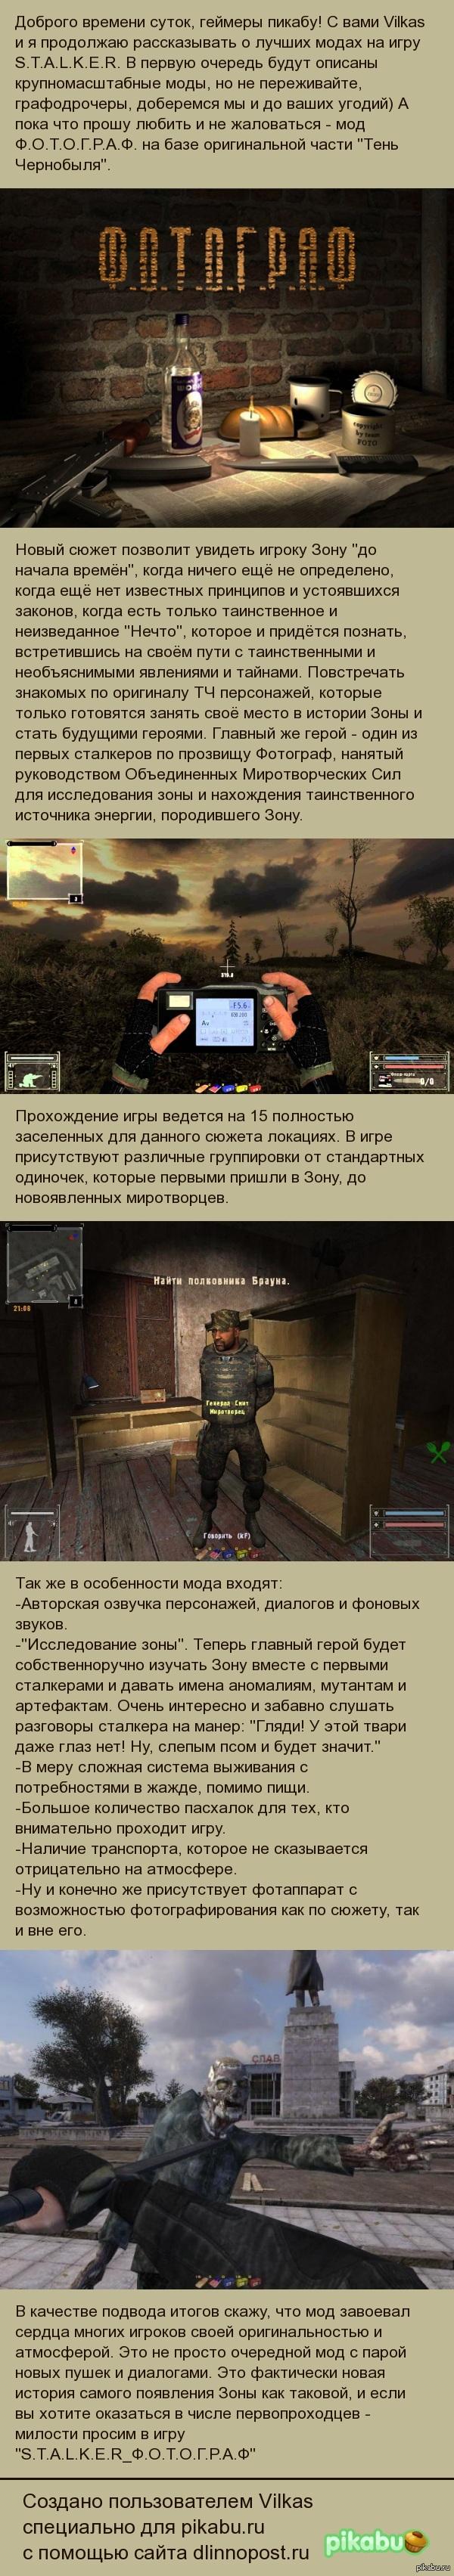 "S.T.A.L.K.E.R. мод - Ф.О.Т.О.Г.Р.А.Ф. Предыдущий пост -<a href=""http://pikabu.ru/story/stalker_mod__taynyie_tropyi_2_3316133"">http://pikabu.ru/story/_3316133</a>"